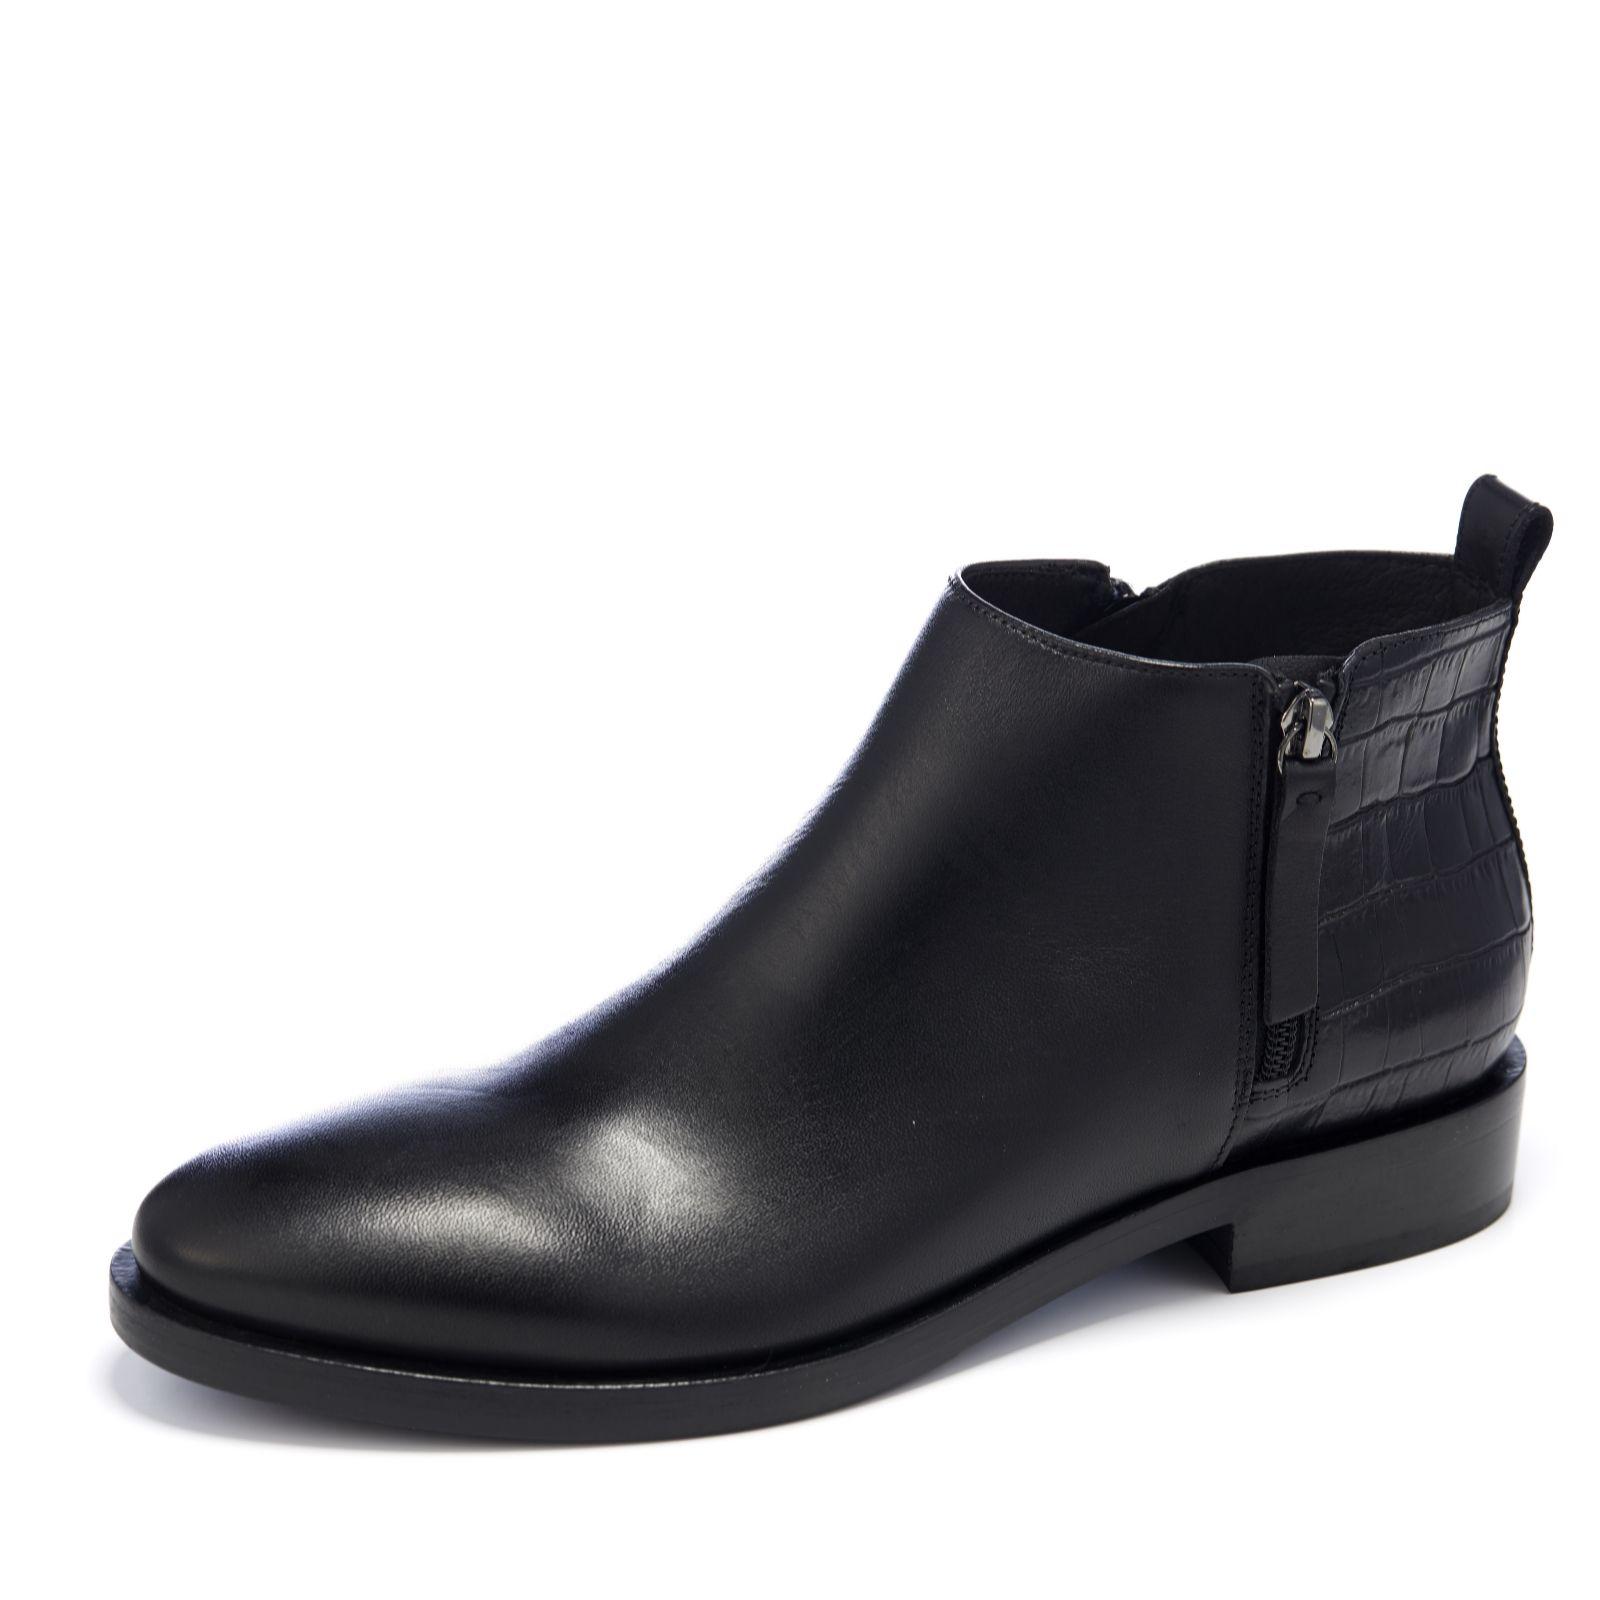 b99daed0a95 Geox Brogue Croc Ankle Boot - QVC UK